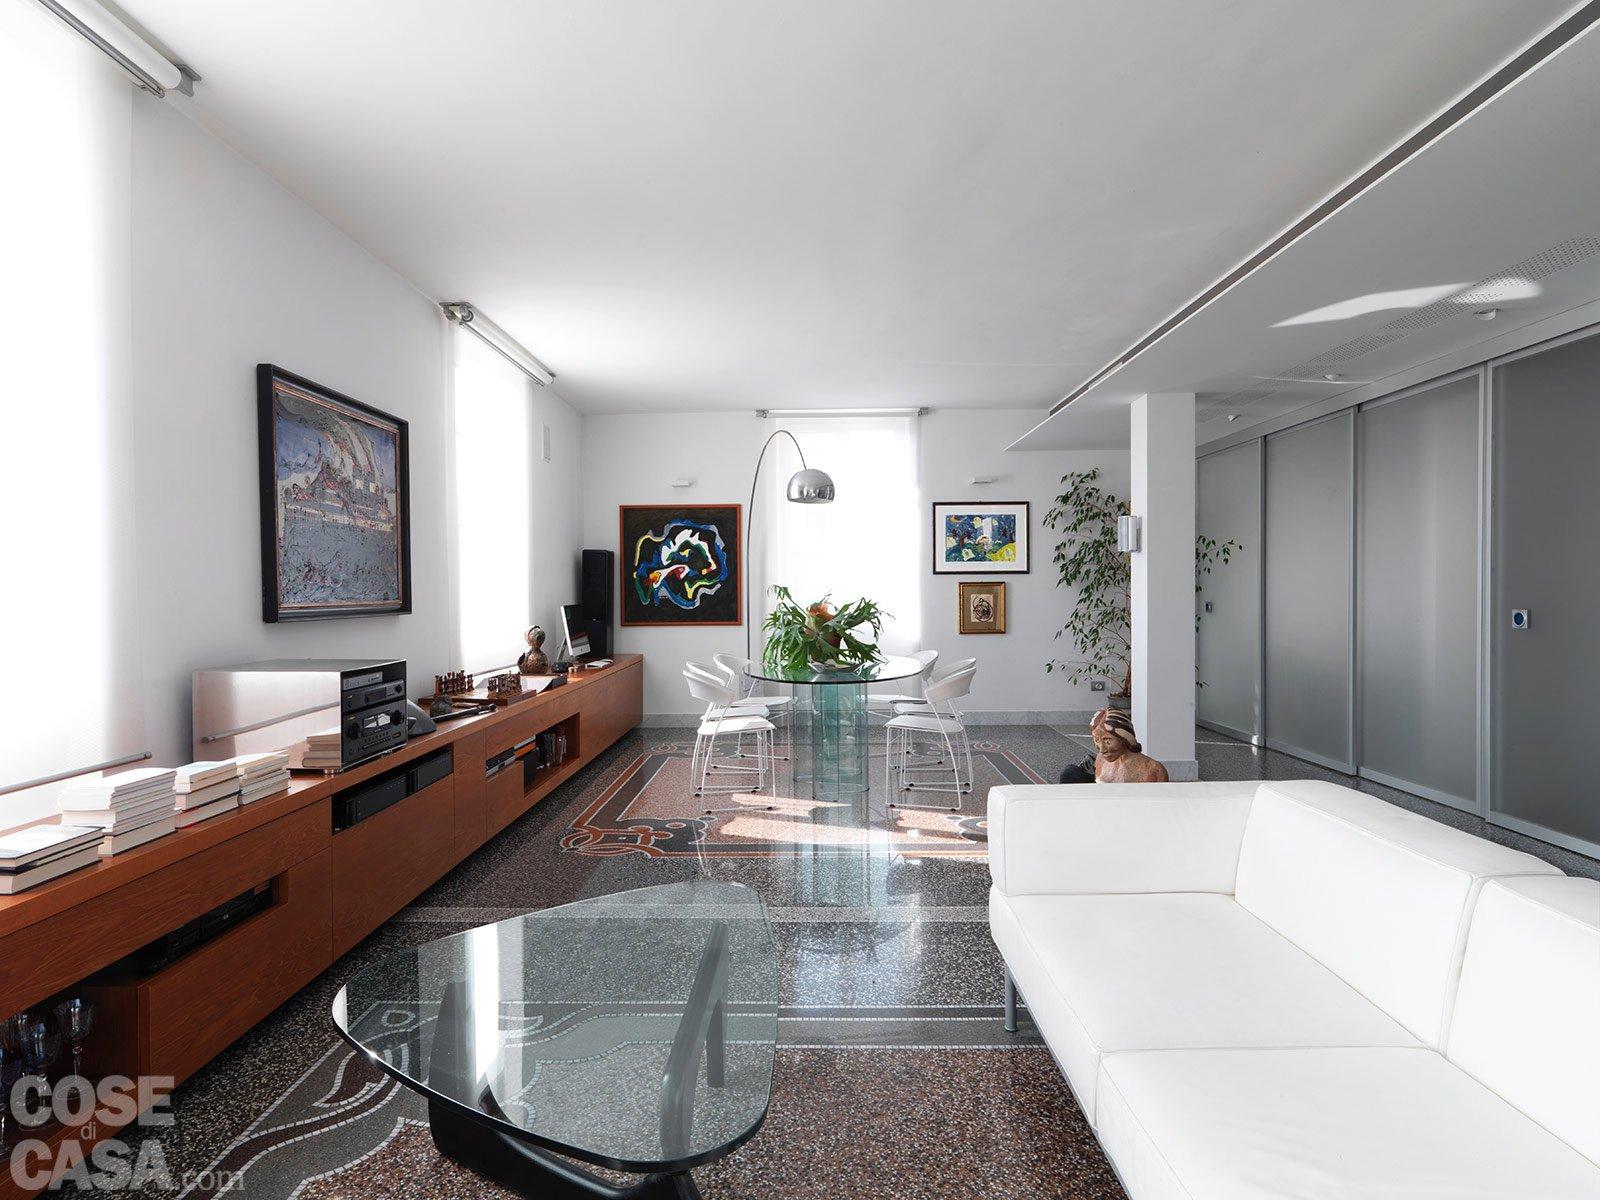 Casa soluzioni hi tech per interni anni 39 30 cose di casa for Soluzioni per arredare casa